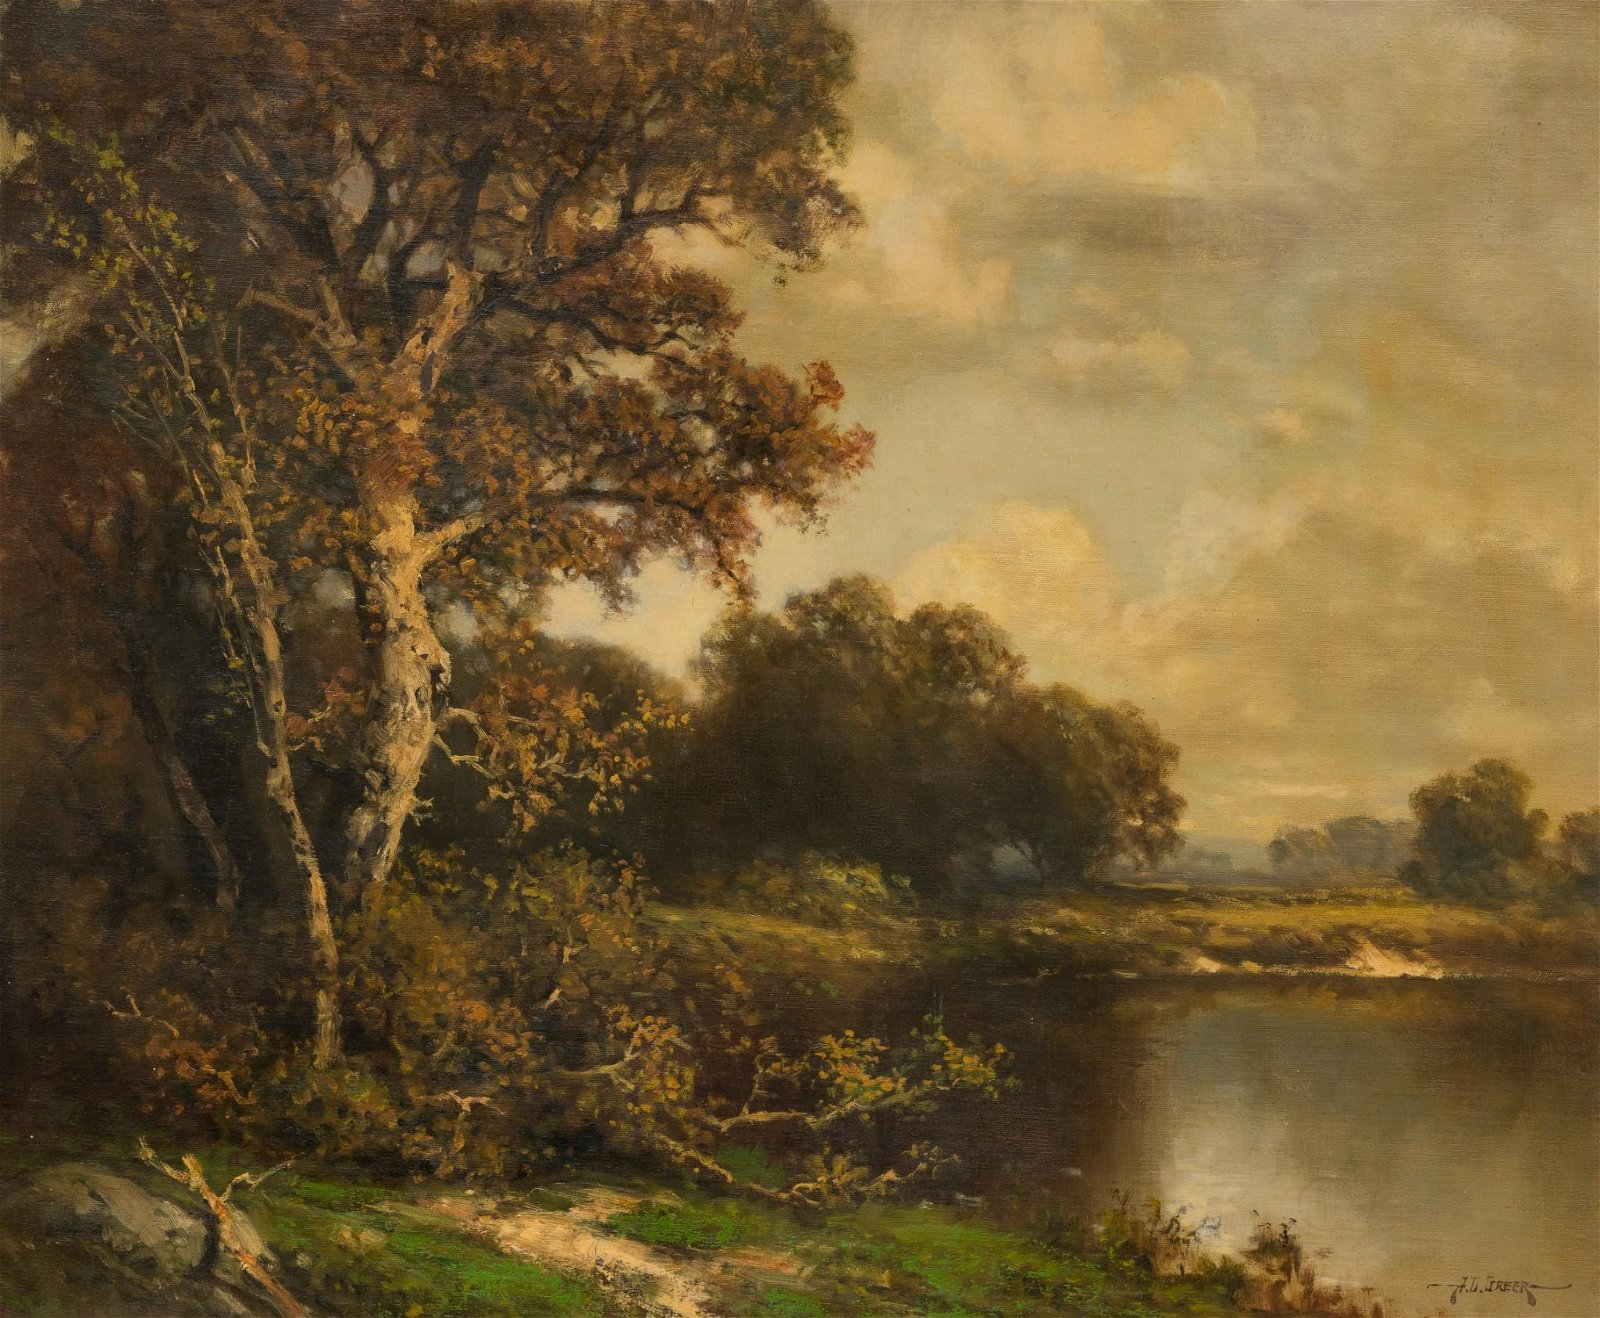 A.D. Greer (1904-1998), Lake Scene, oil on canvas